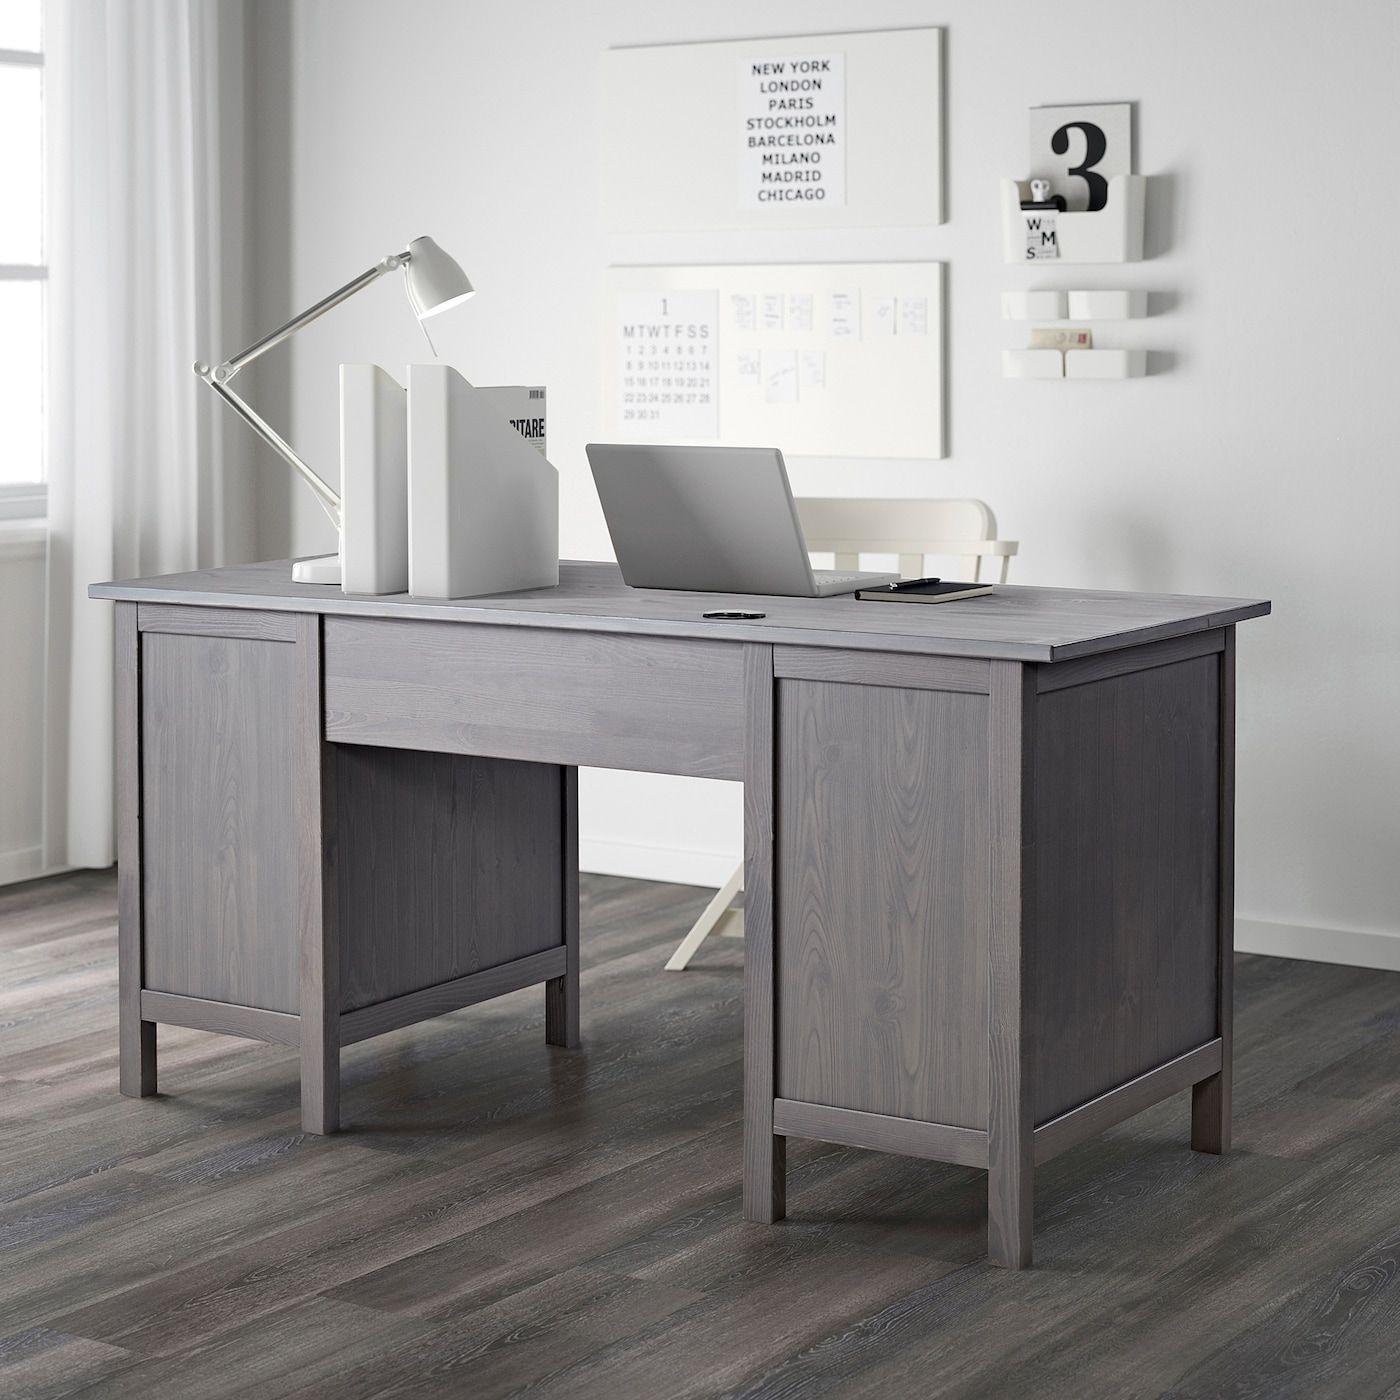 HEMNES Desk dark gray stained IKEA in 2020 Grey desk